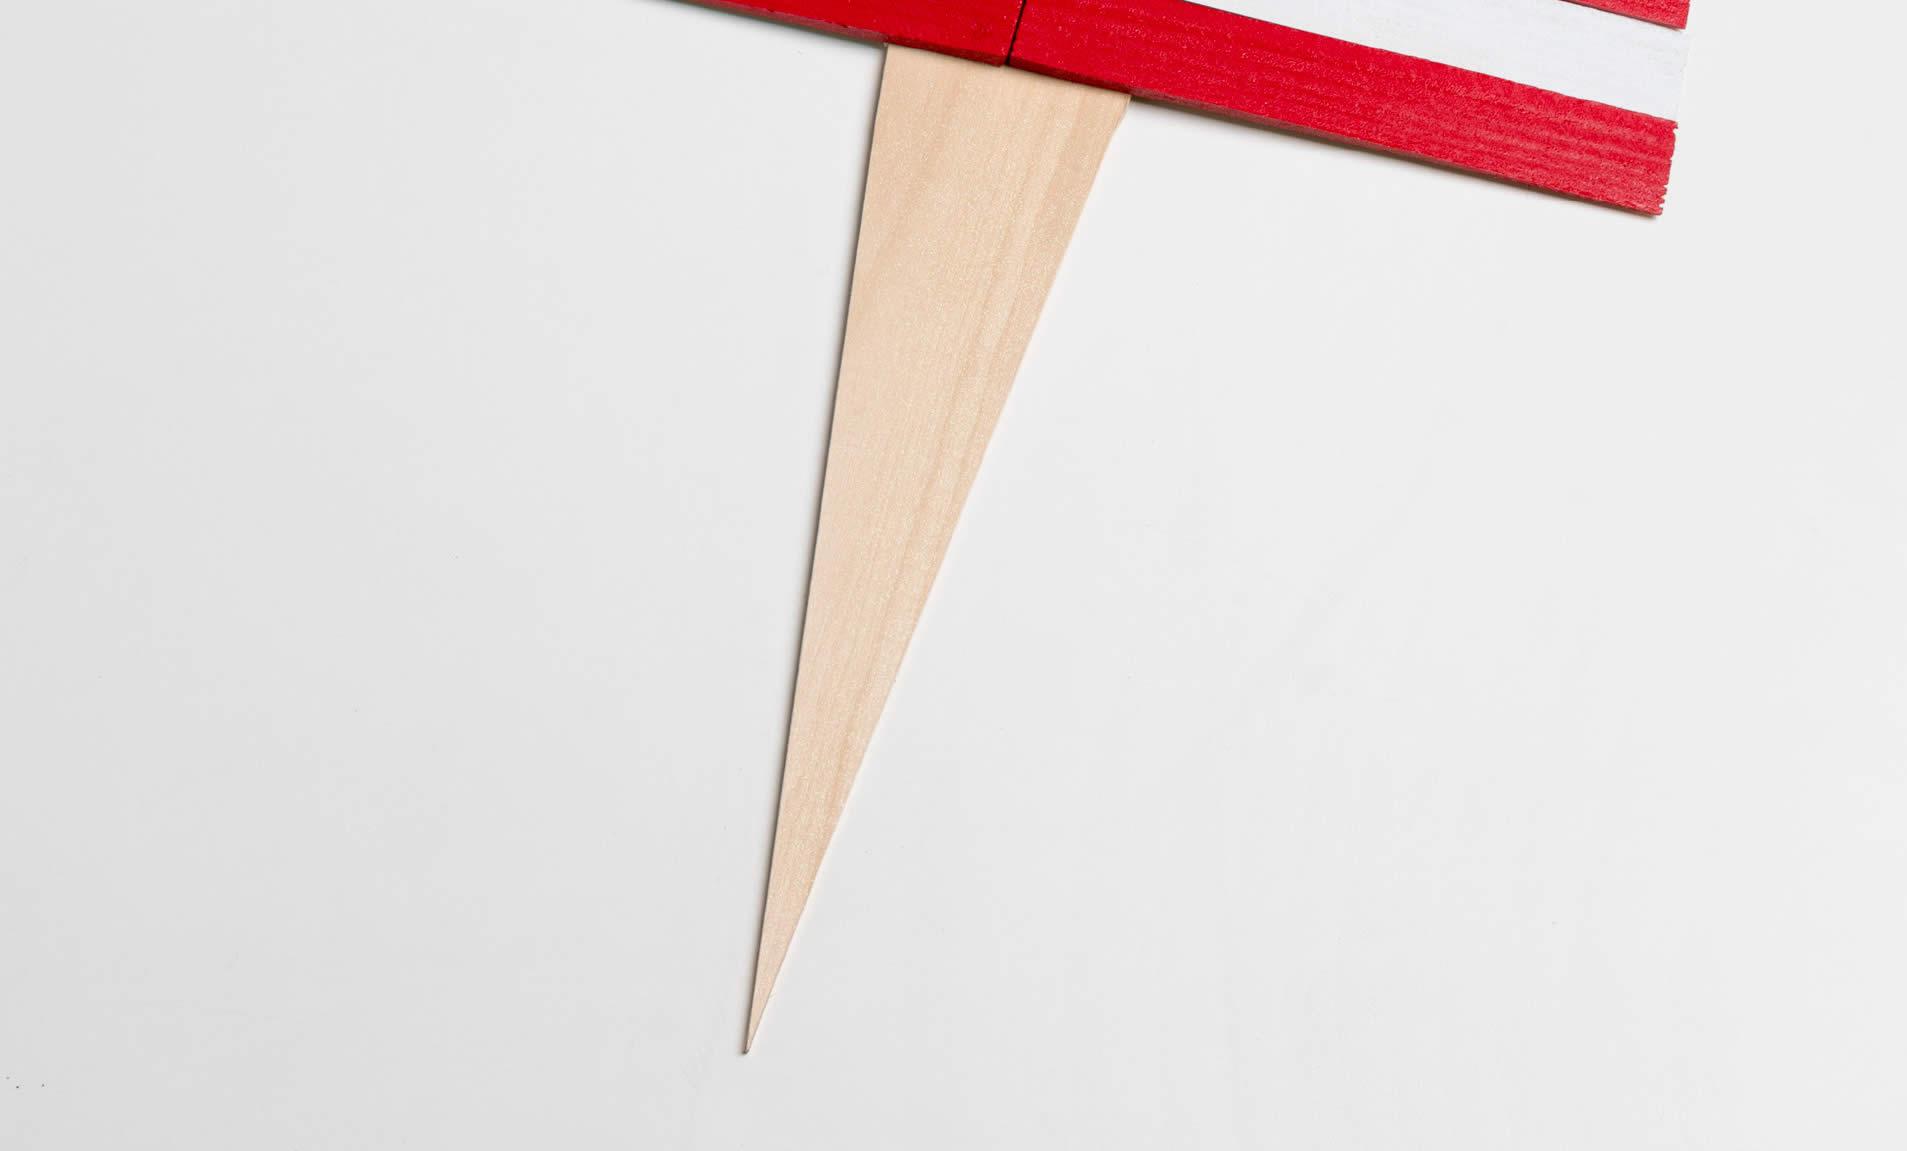 patriotic-flag-arrow-project-step5b.jpg